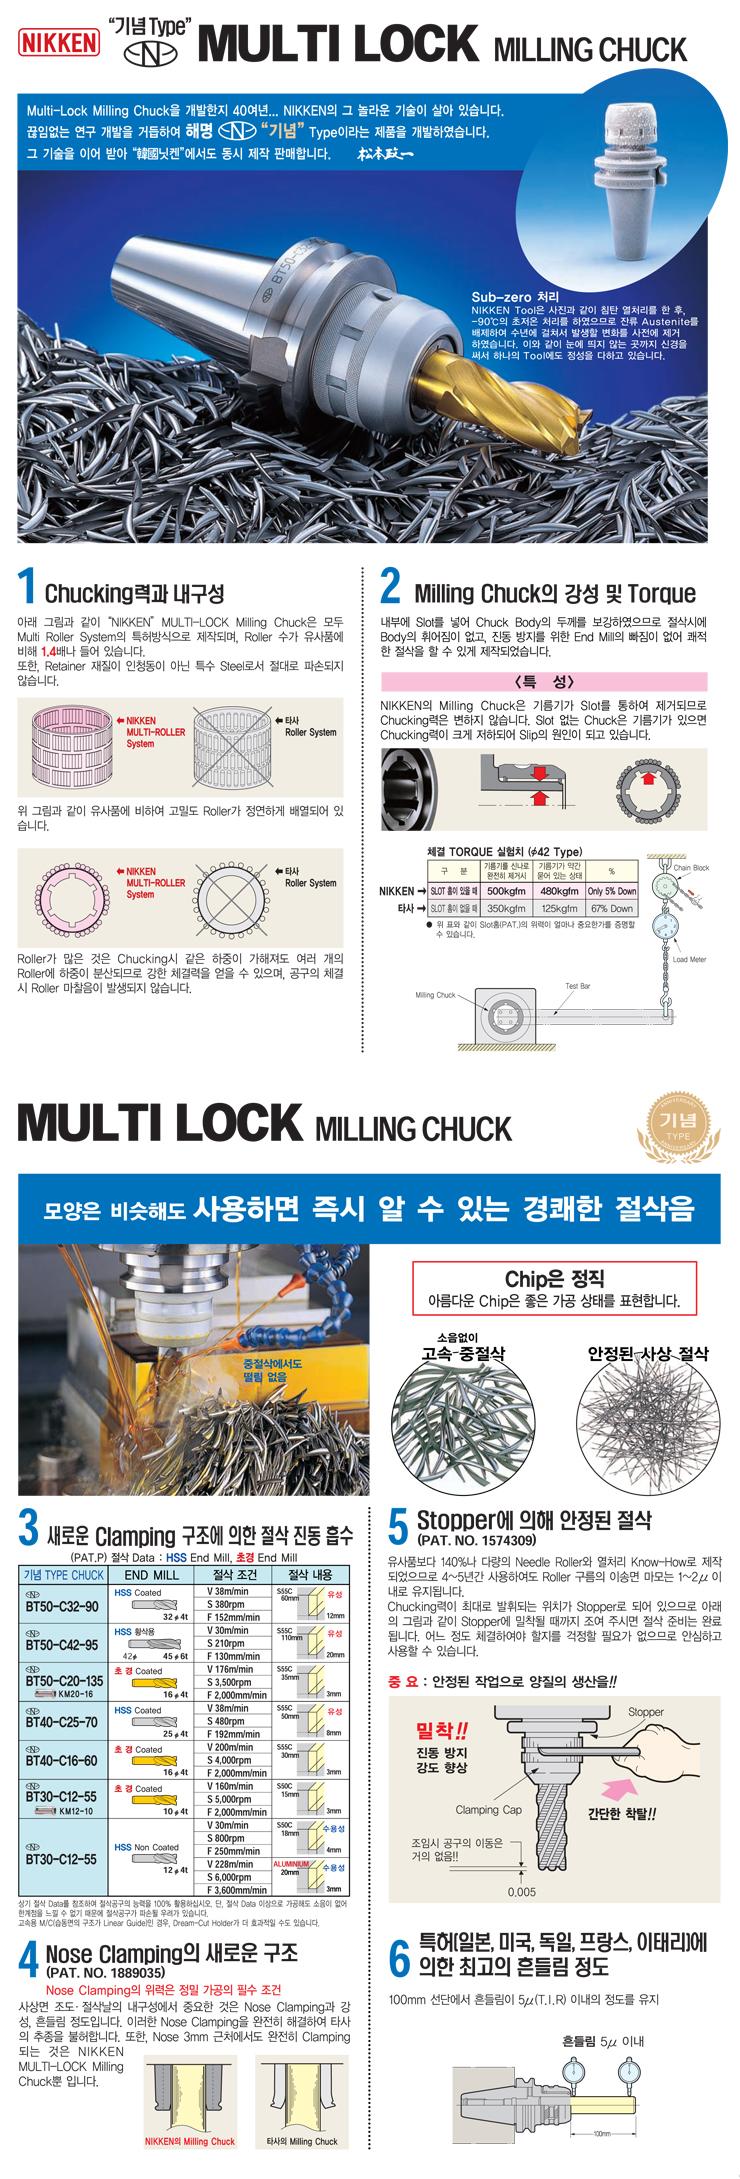 MULTI LOCK MILLING CHUCK.jpg